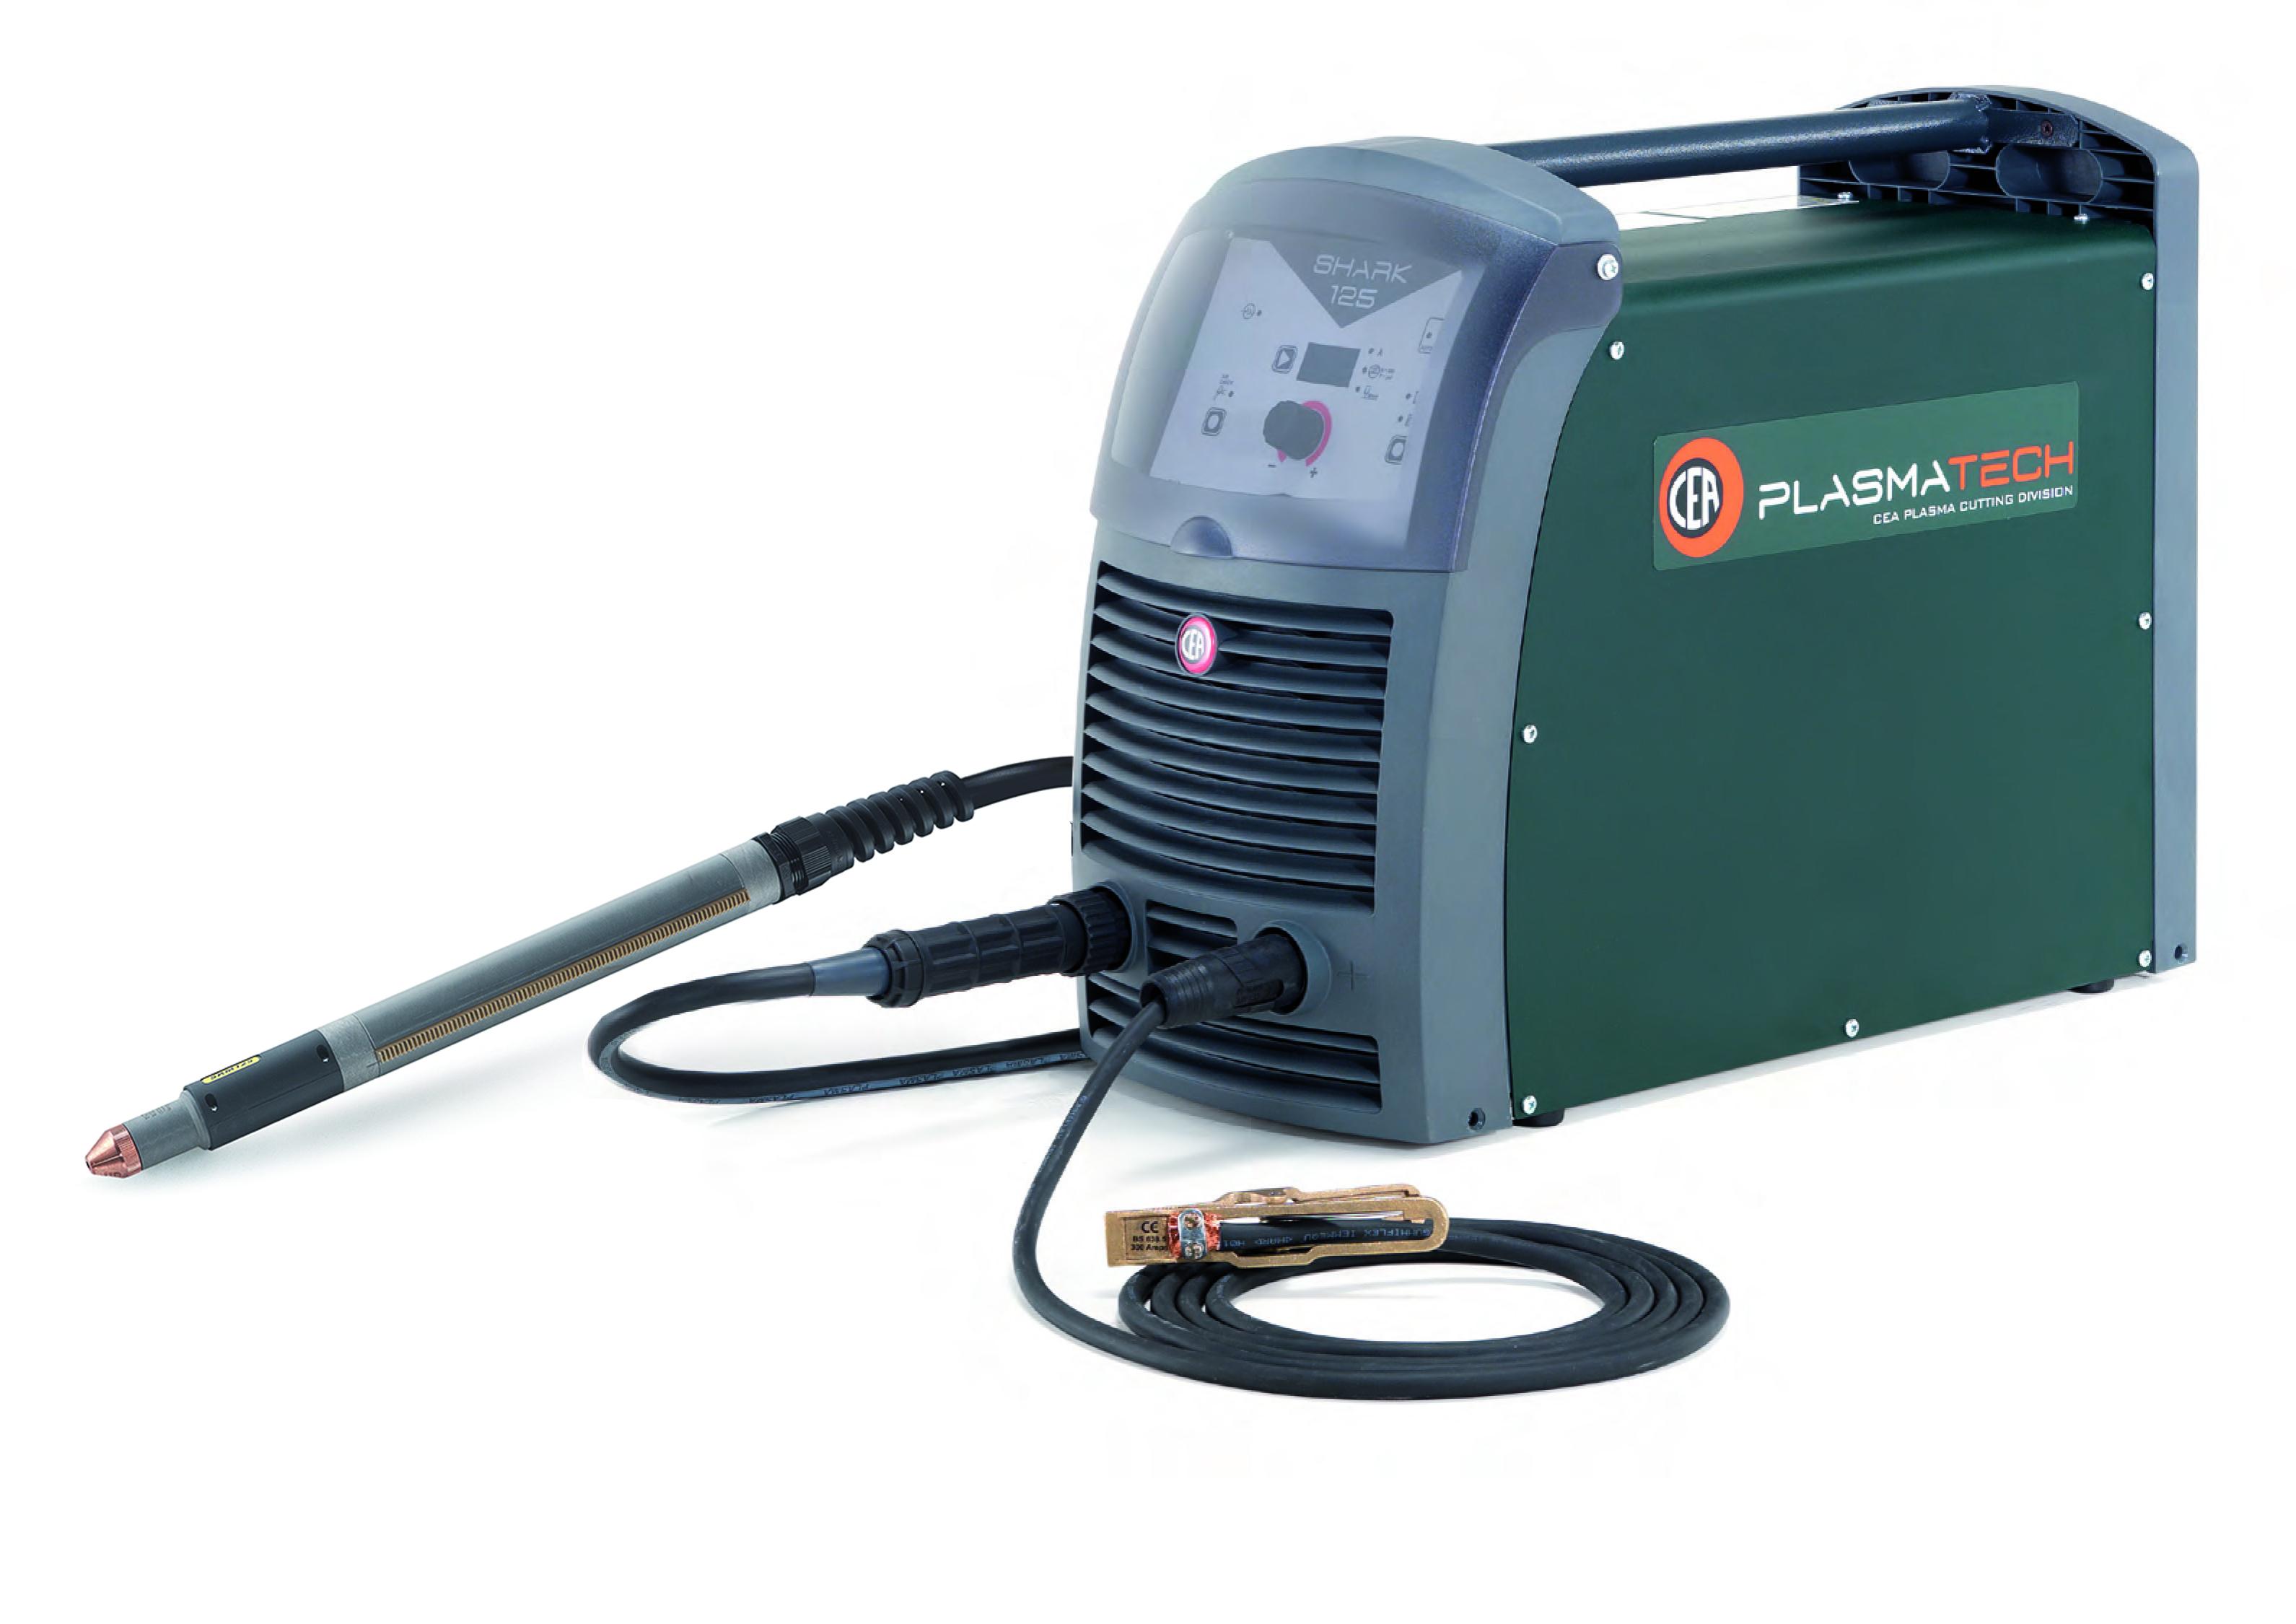 taglio plasma automatico 120a